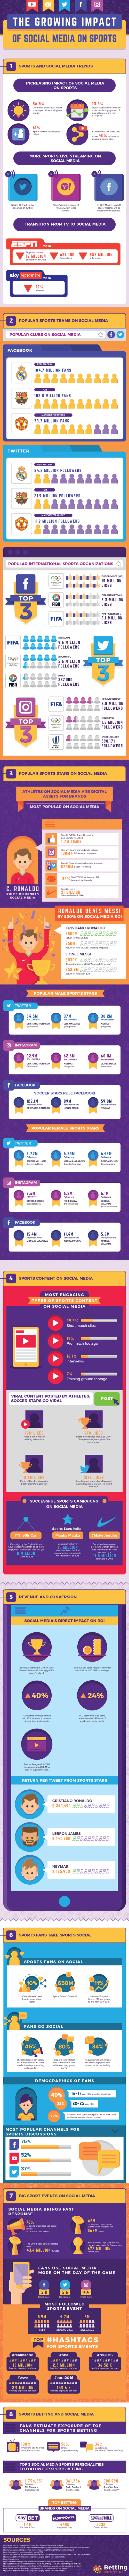 Infographic-increasing-sport-socialmedia